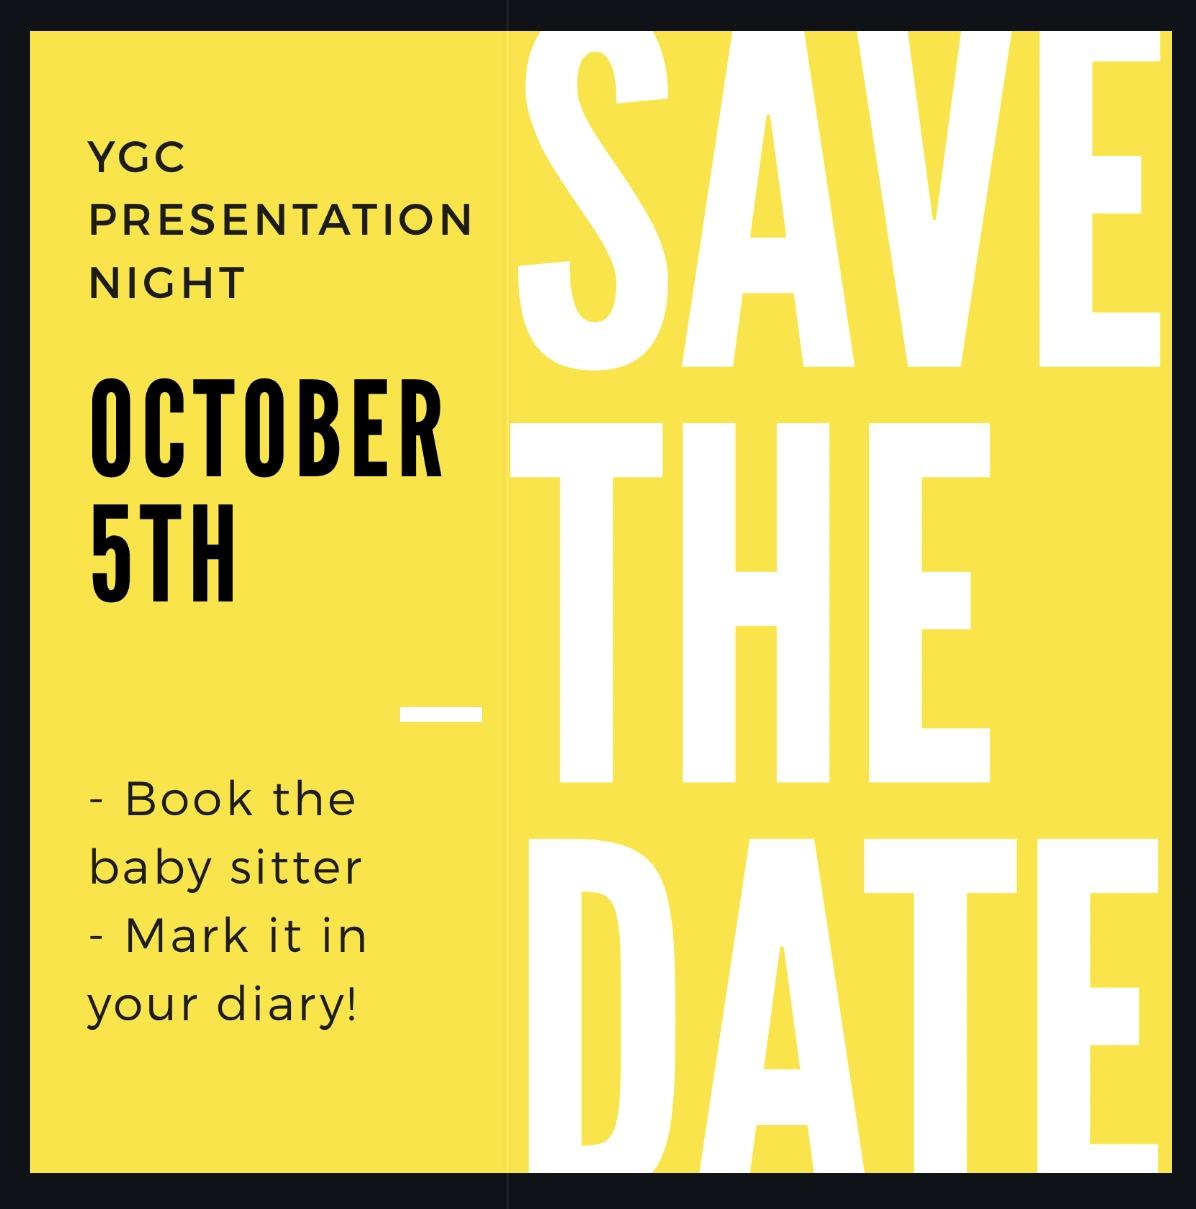 YGC-PresNight2018